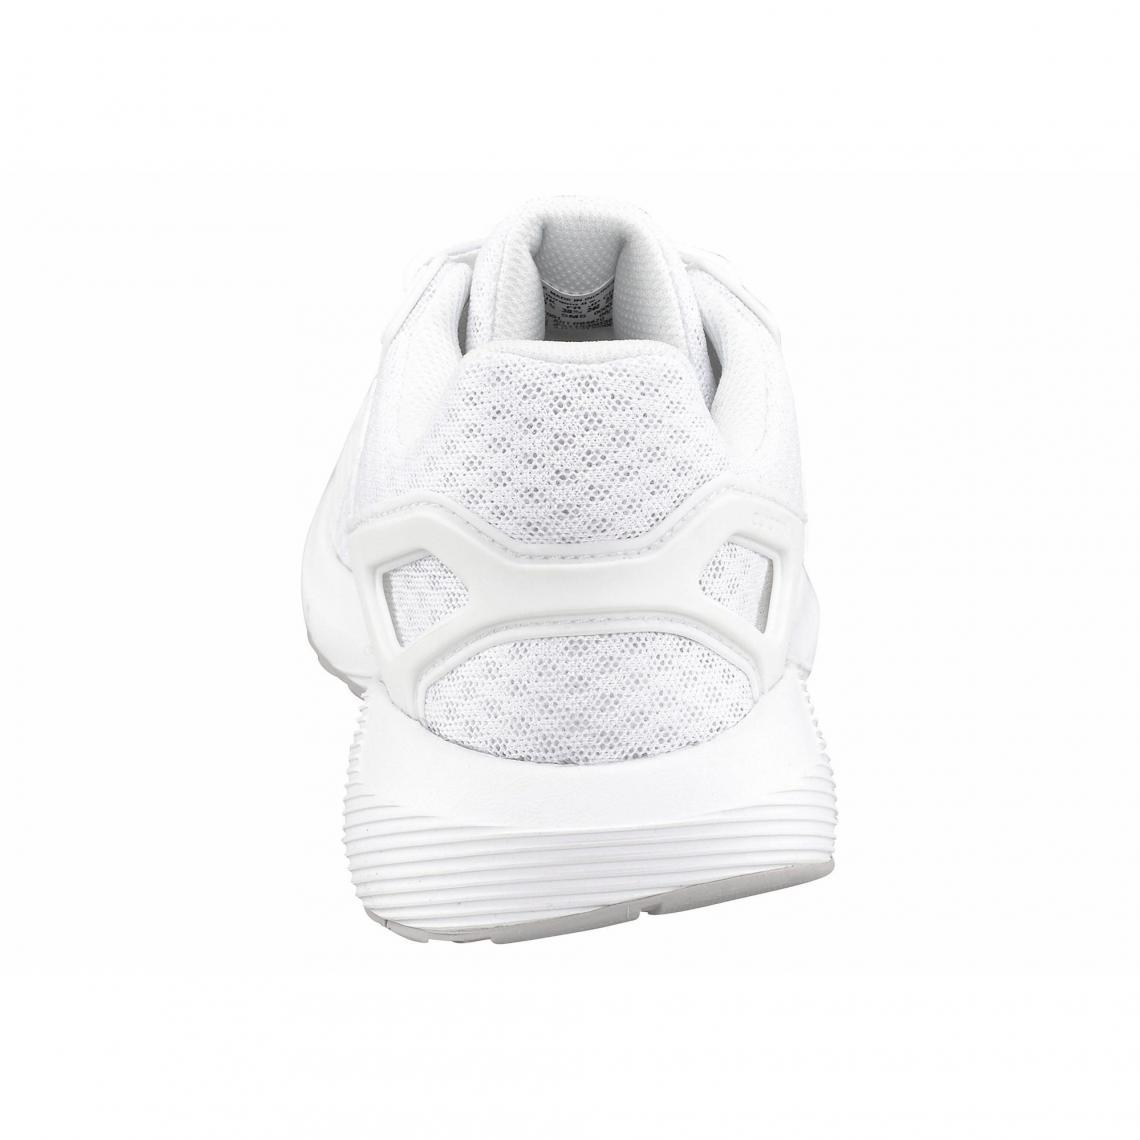 official photos def14 114b2 adidas Performance Duramo 8 chaussures de running femme - Blanc Adidas  Performance